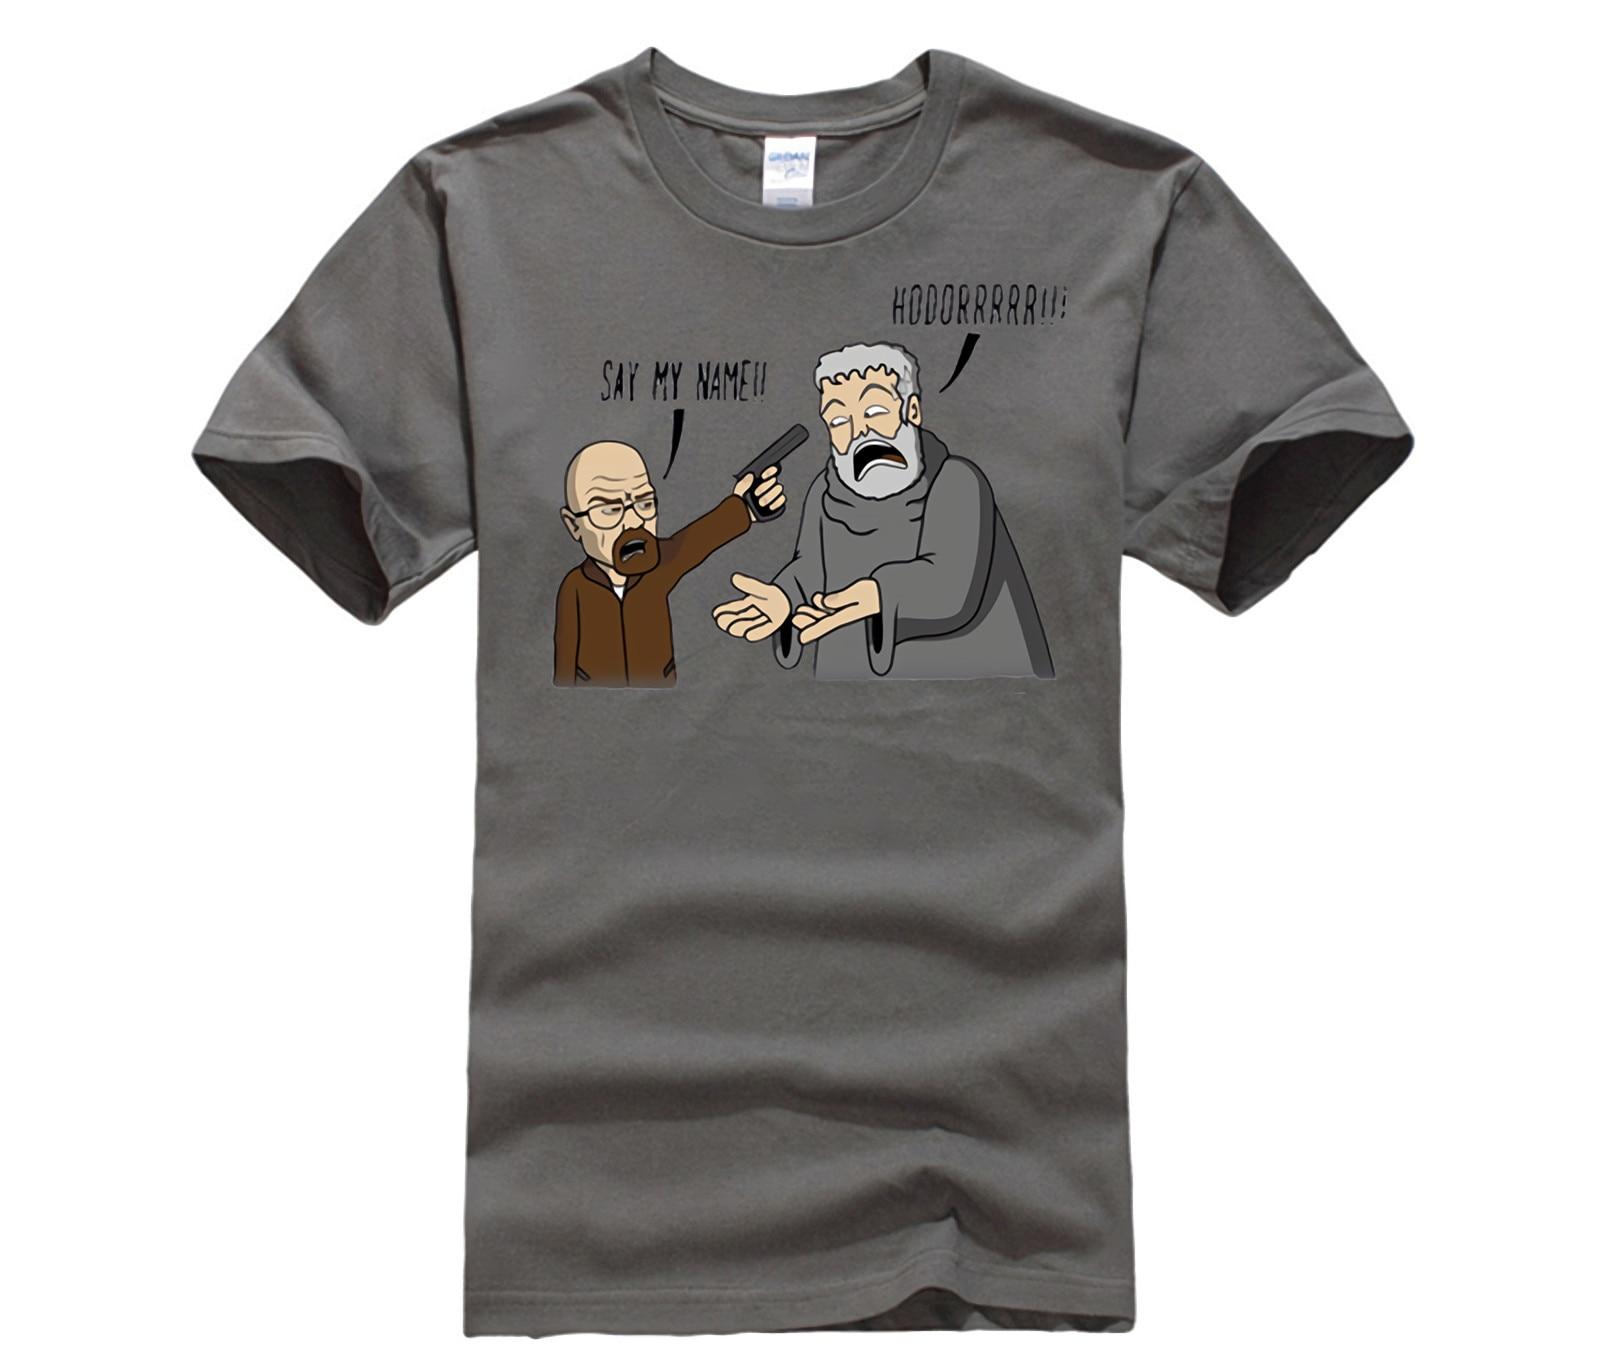 Alta qualidade popular Breaking Bad T-Shirt Hodor Game of Thrones homme dos homens Dos Ganhos tshirt